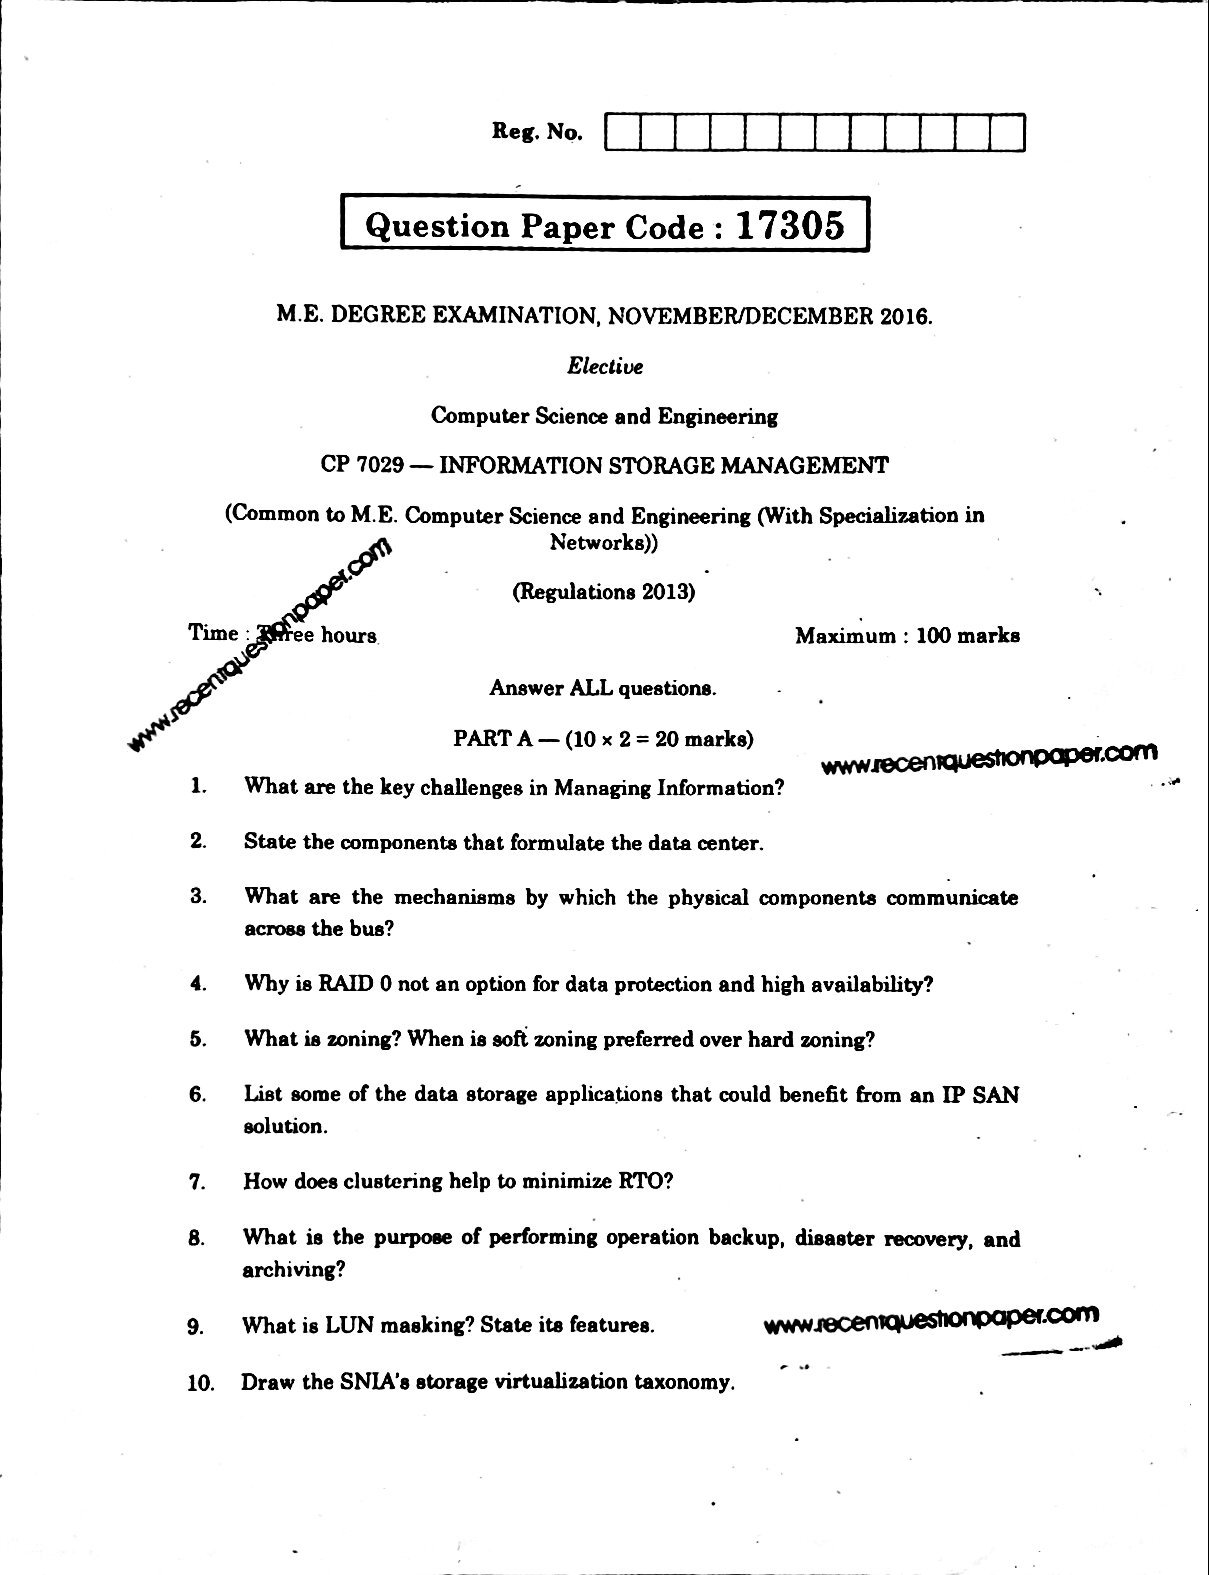 CP7029 Information Storage Management Anna University Question paper Nov/Dec 2016